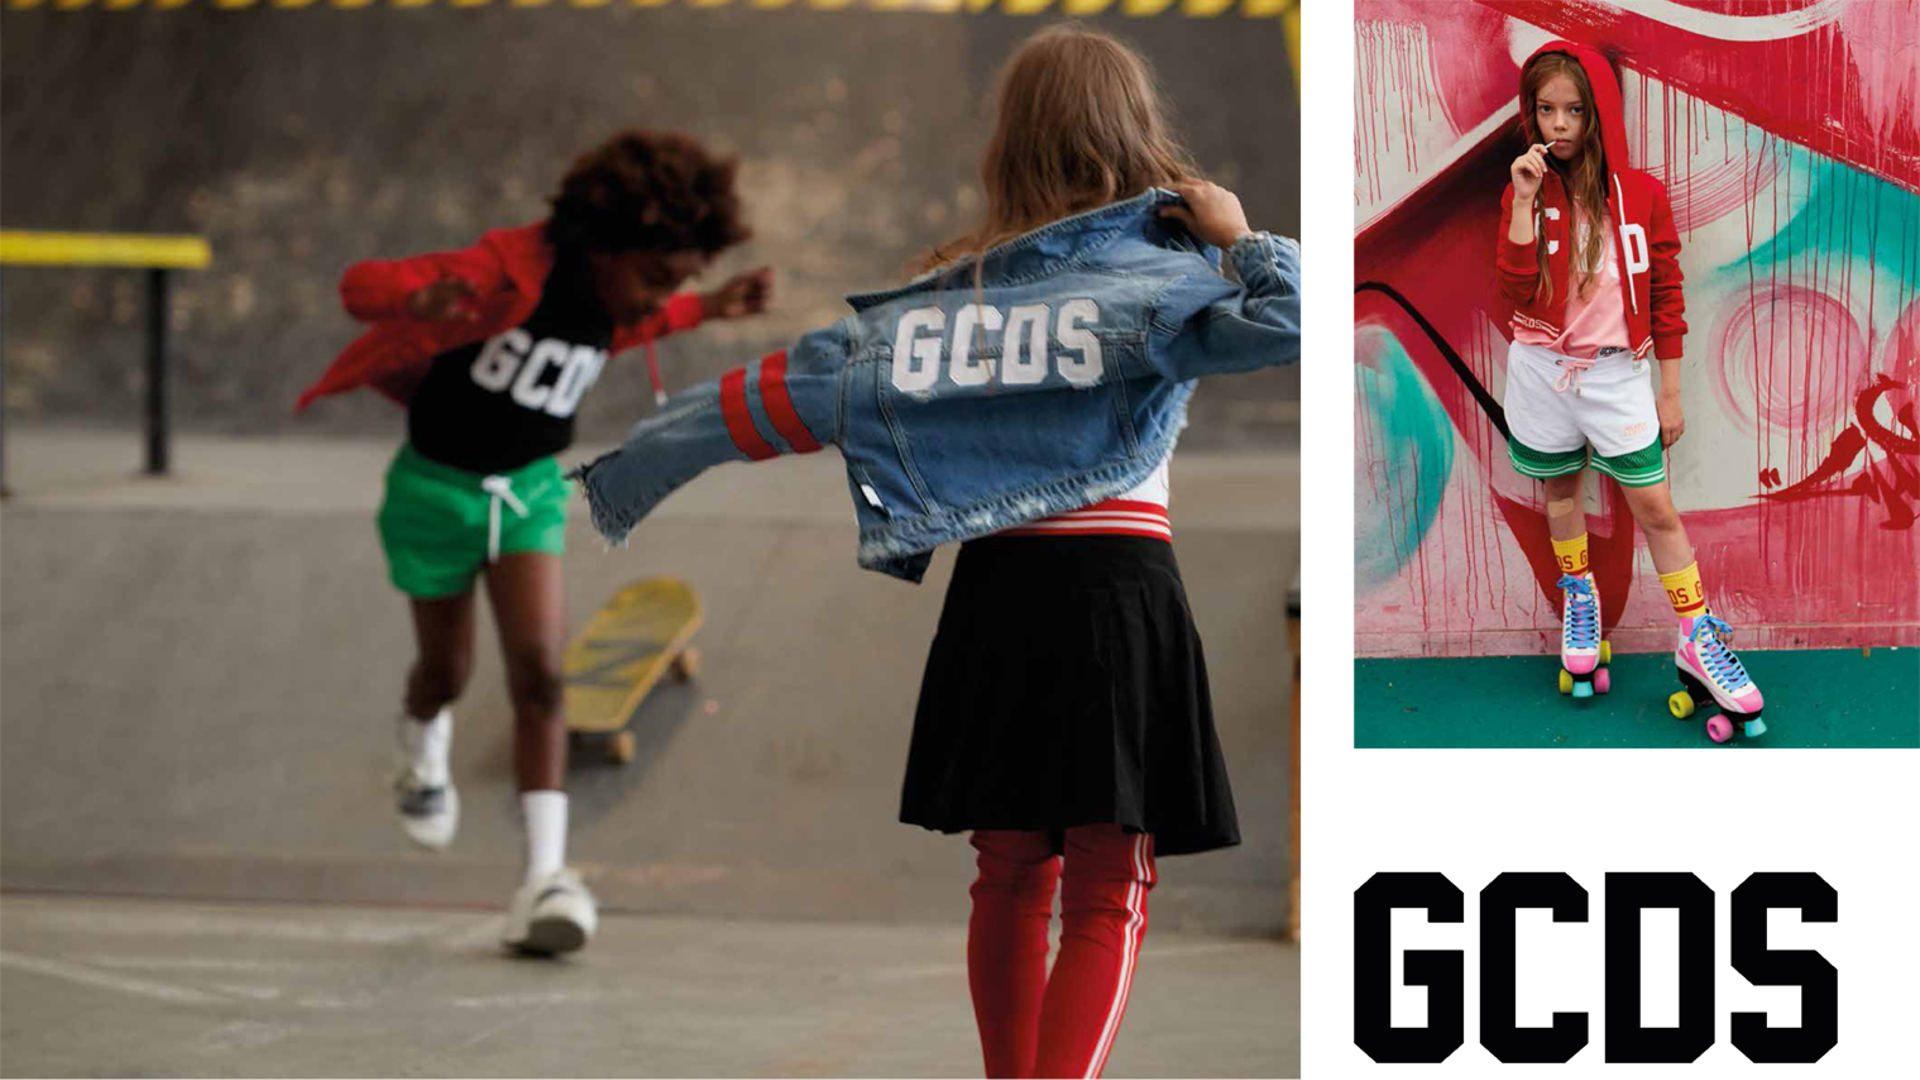 gcds-mini